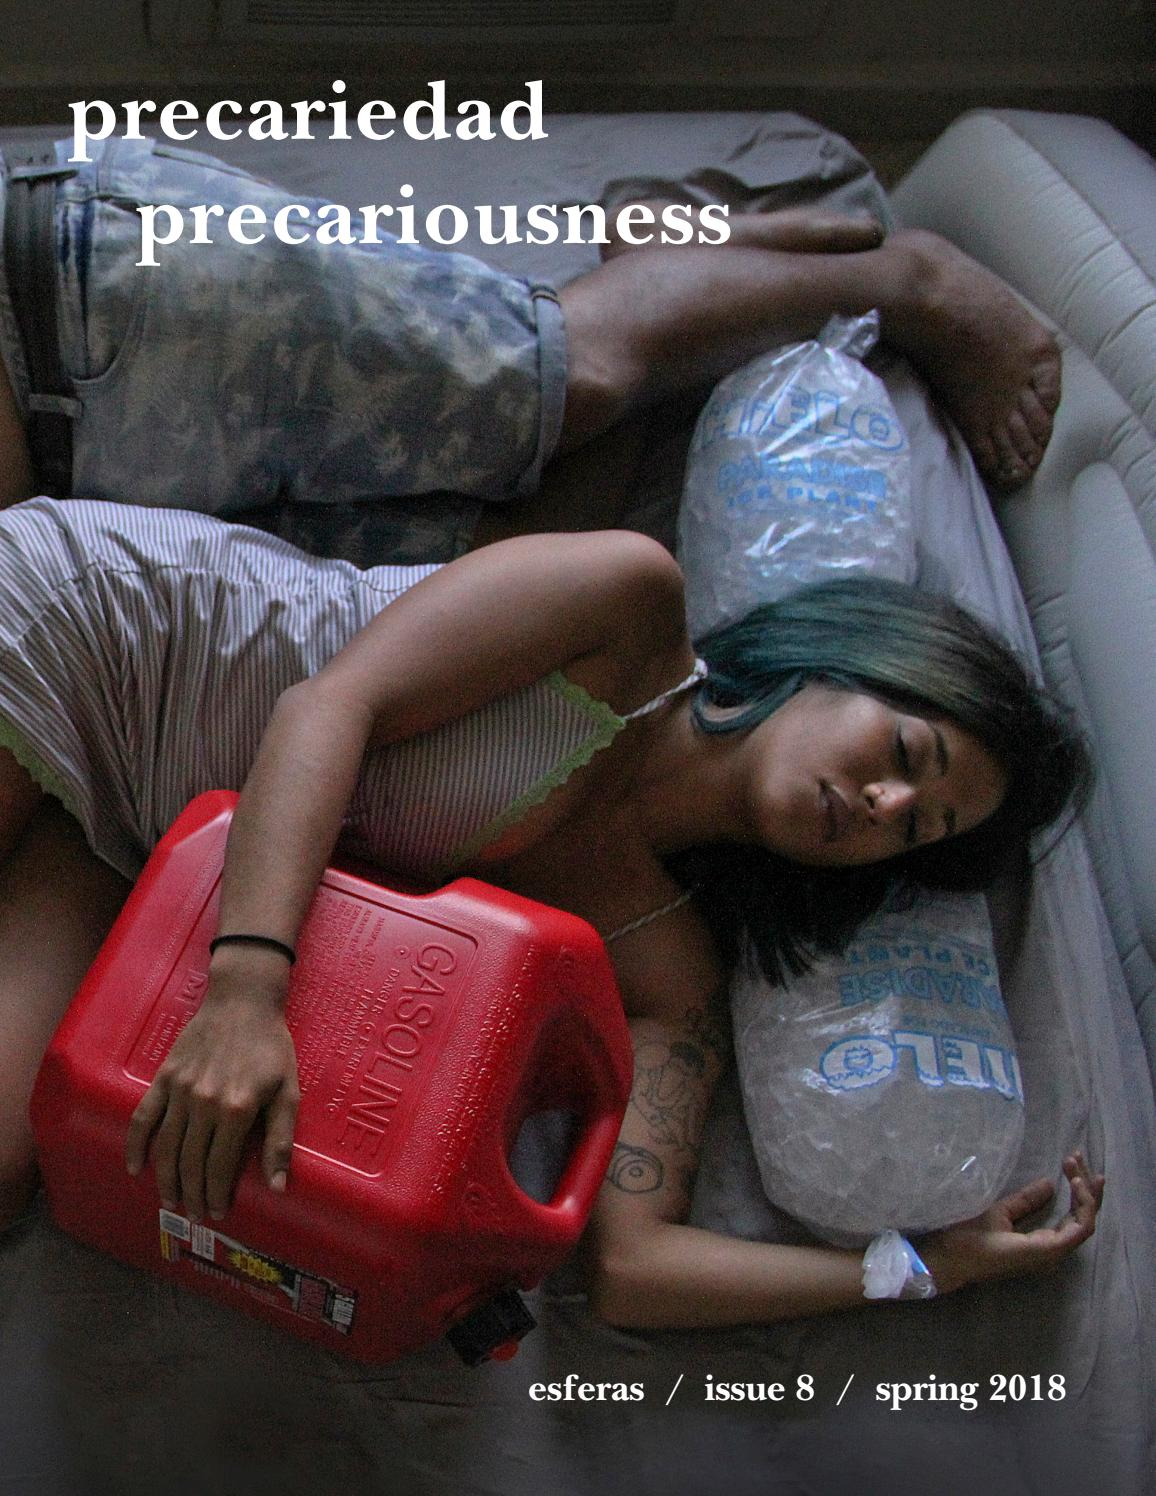 afc22d2caab6 Esferas 8: Precariedad/Precariousness by NYU Esferas - issuu